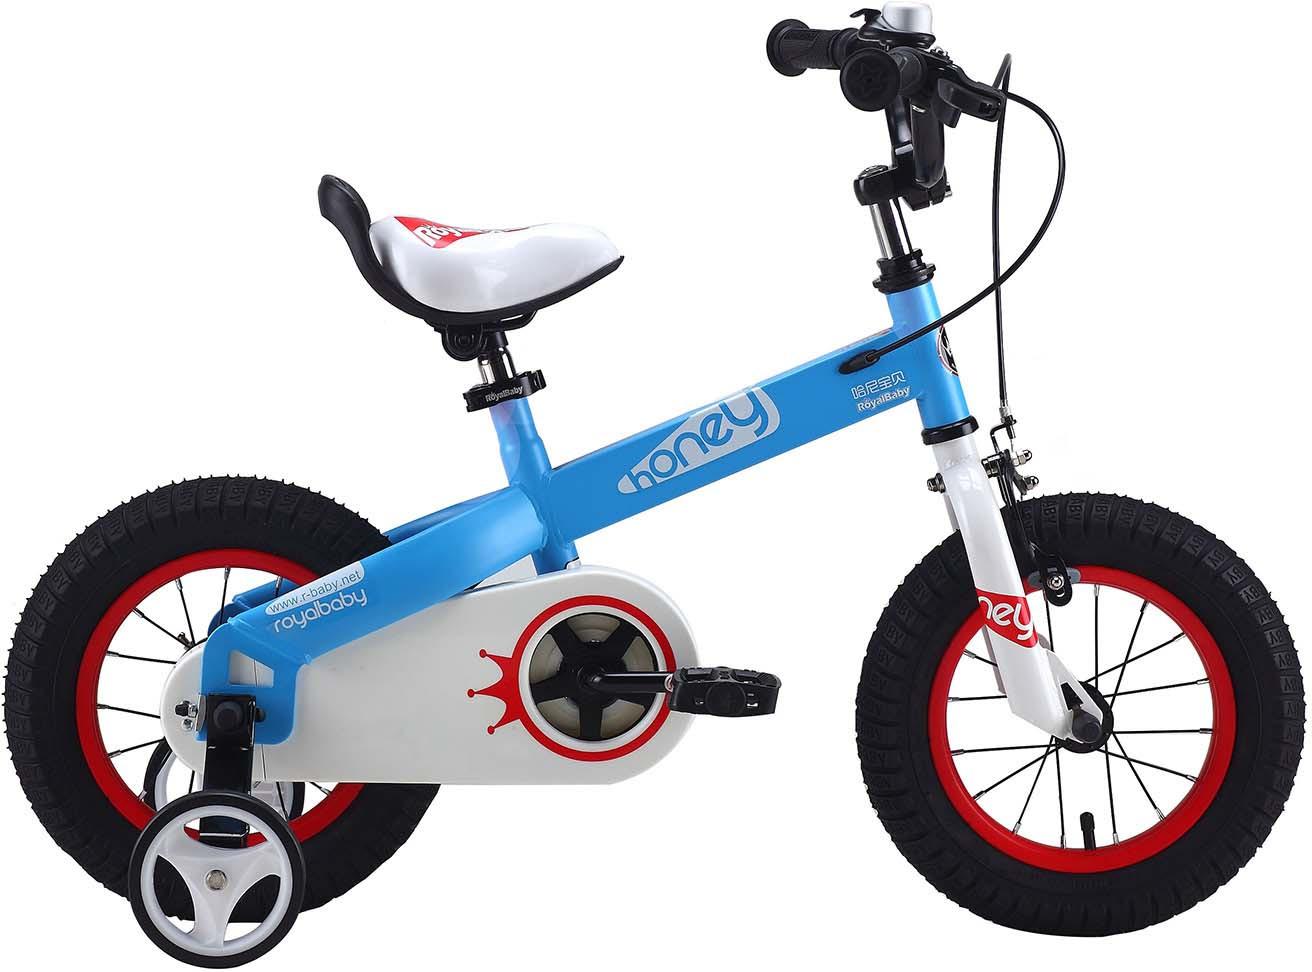 Велосипед Royal Baby Honey Steel 14, RB14-15 HONEY, голубой велосипед для организма